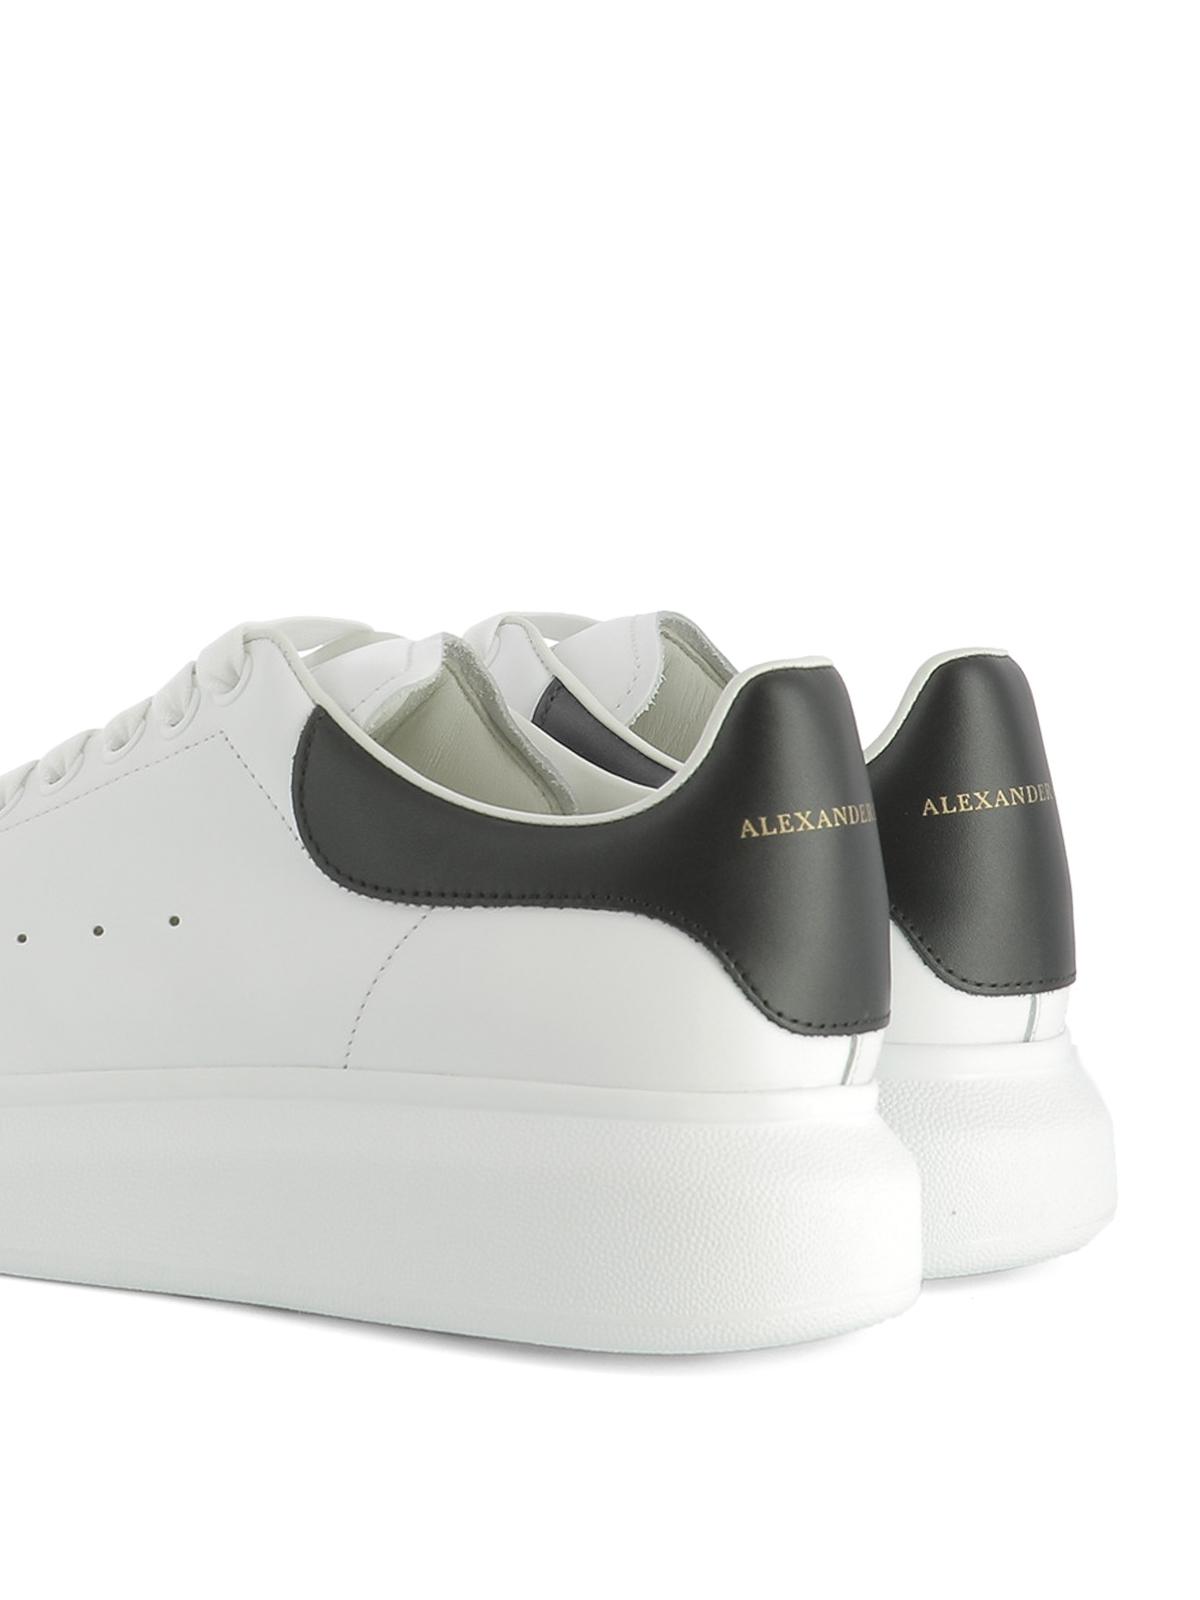 713e090df032 Alexander Mcqueen - Two-tone sneakers - trainers - 441631WHGP59061